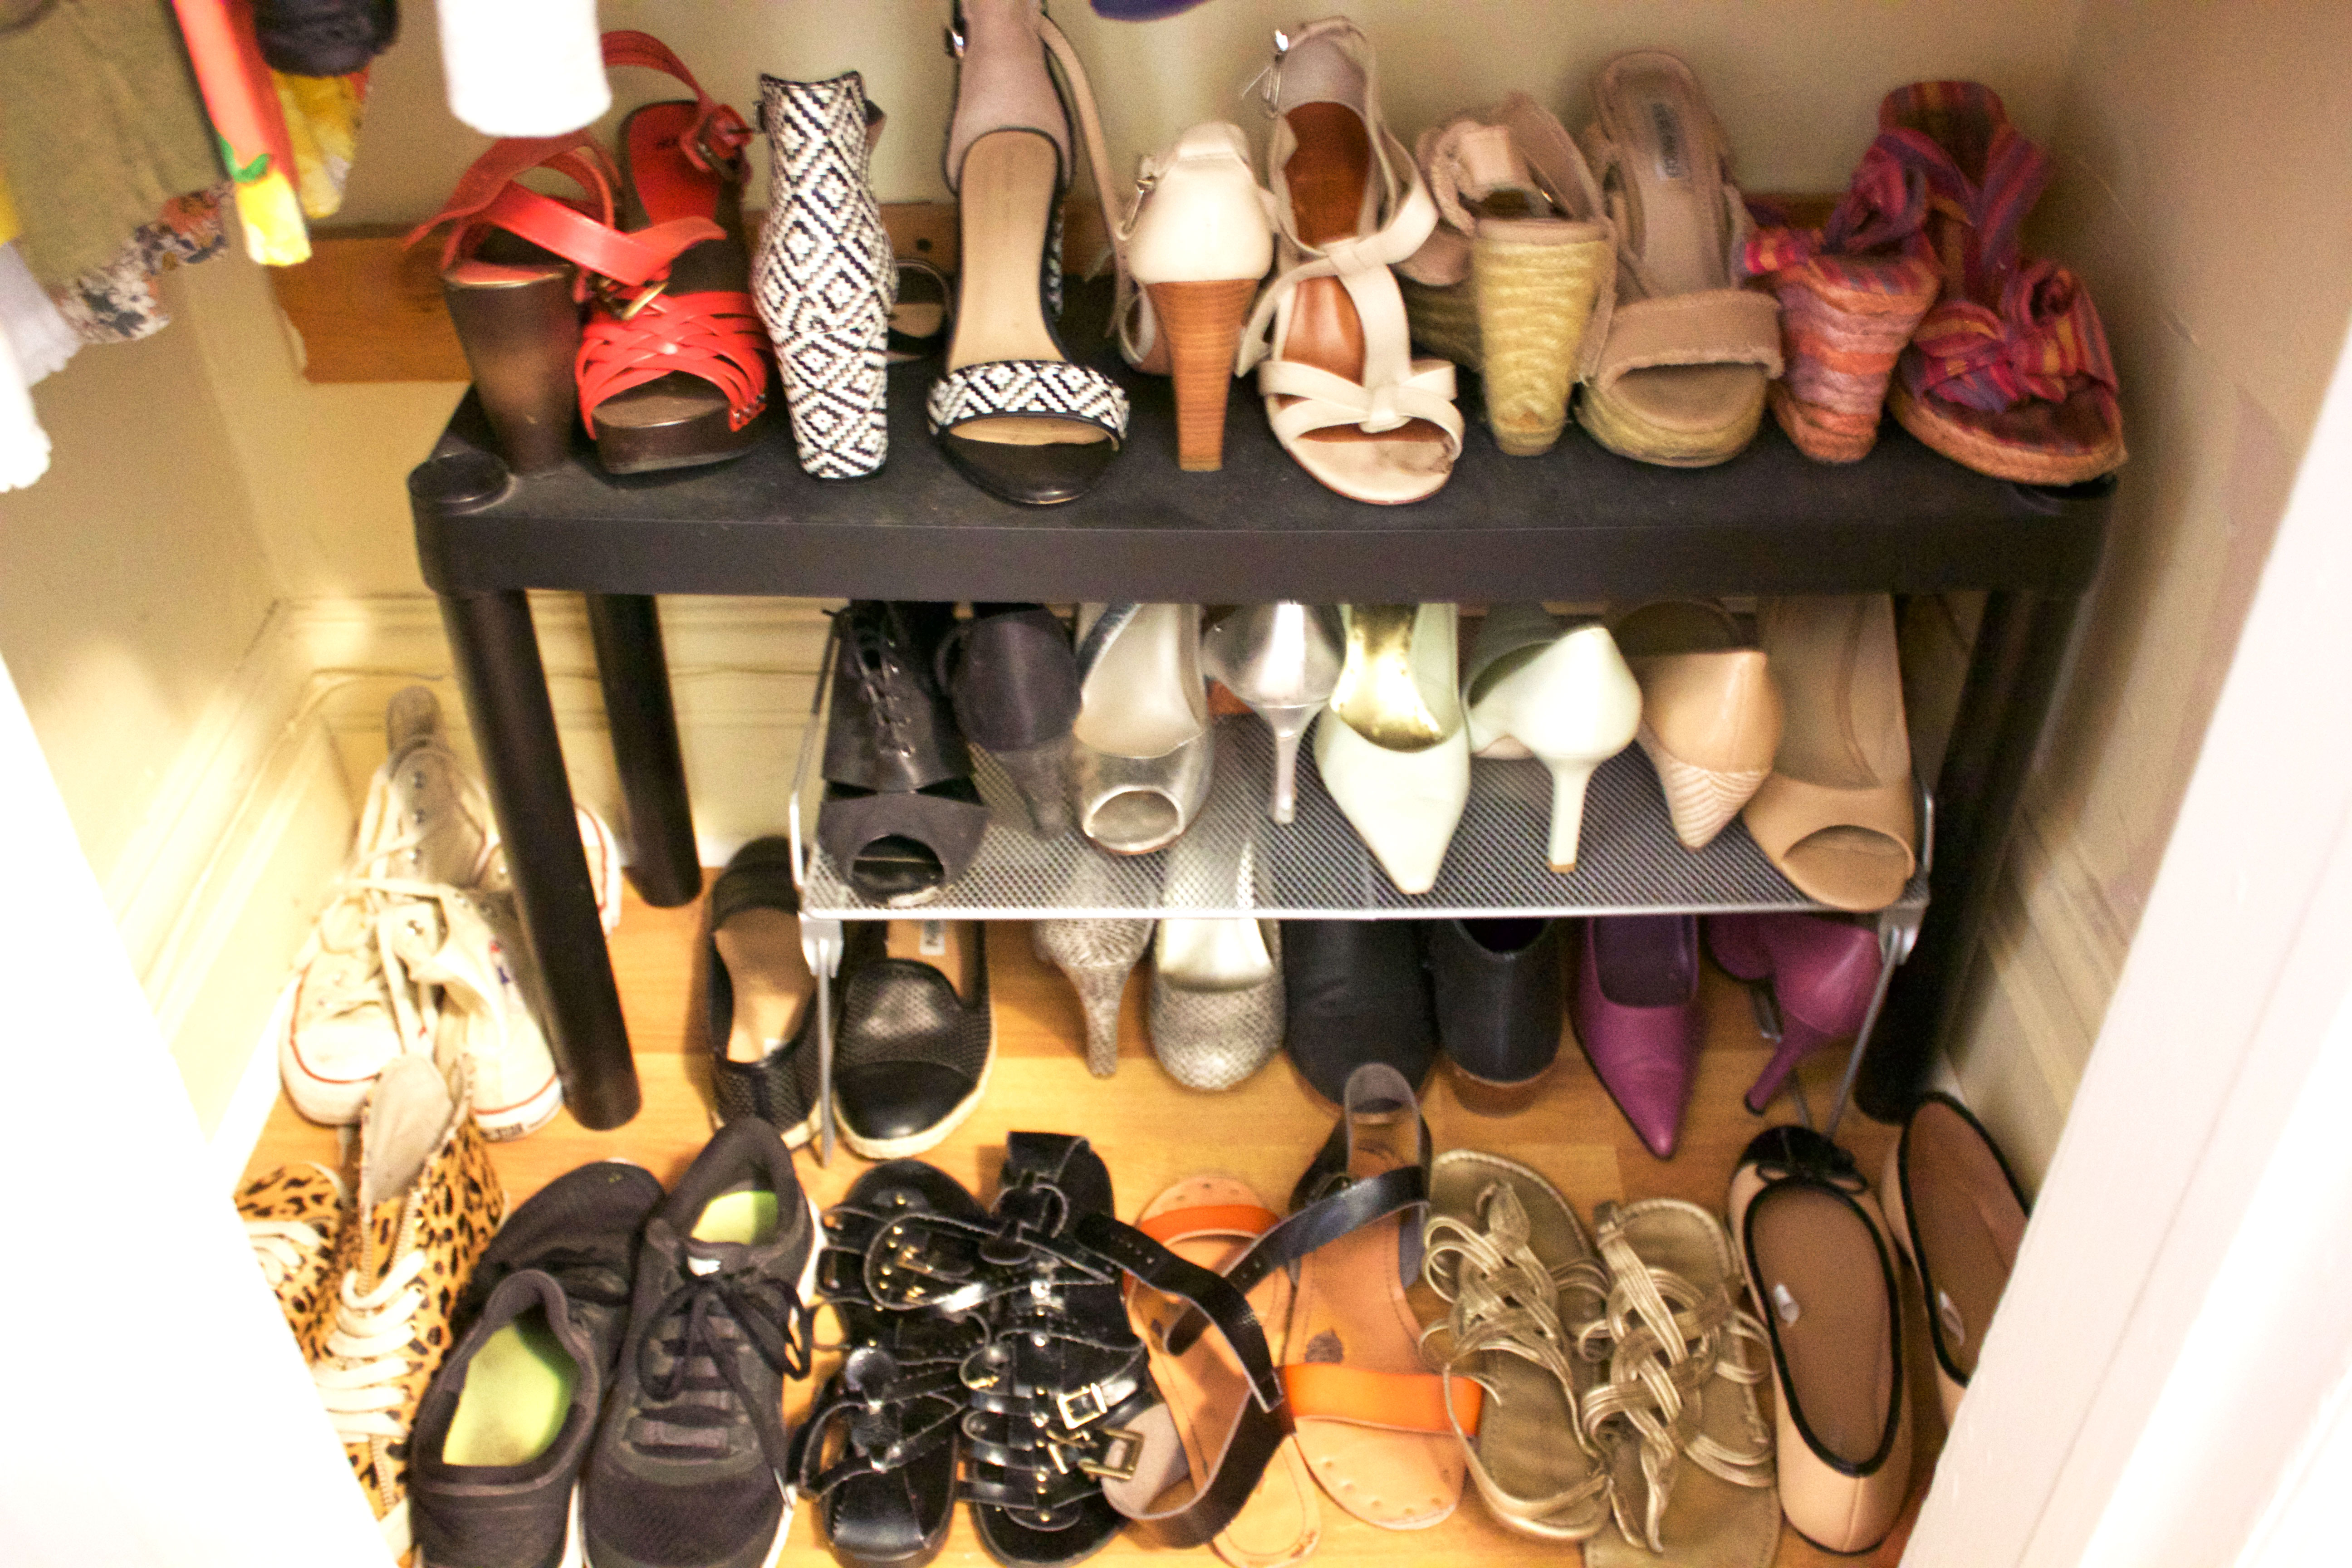 Merveilleux Organized Shoes Closet Nyc Professional Organizer Anna Bauer